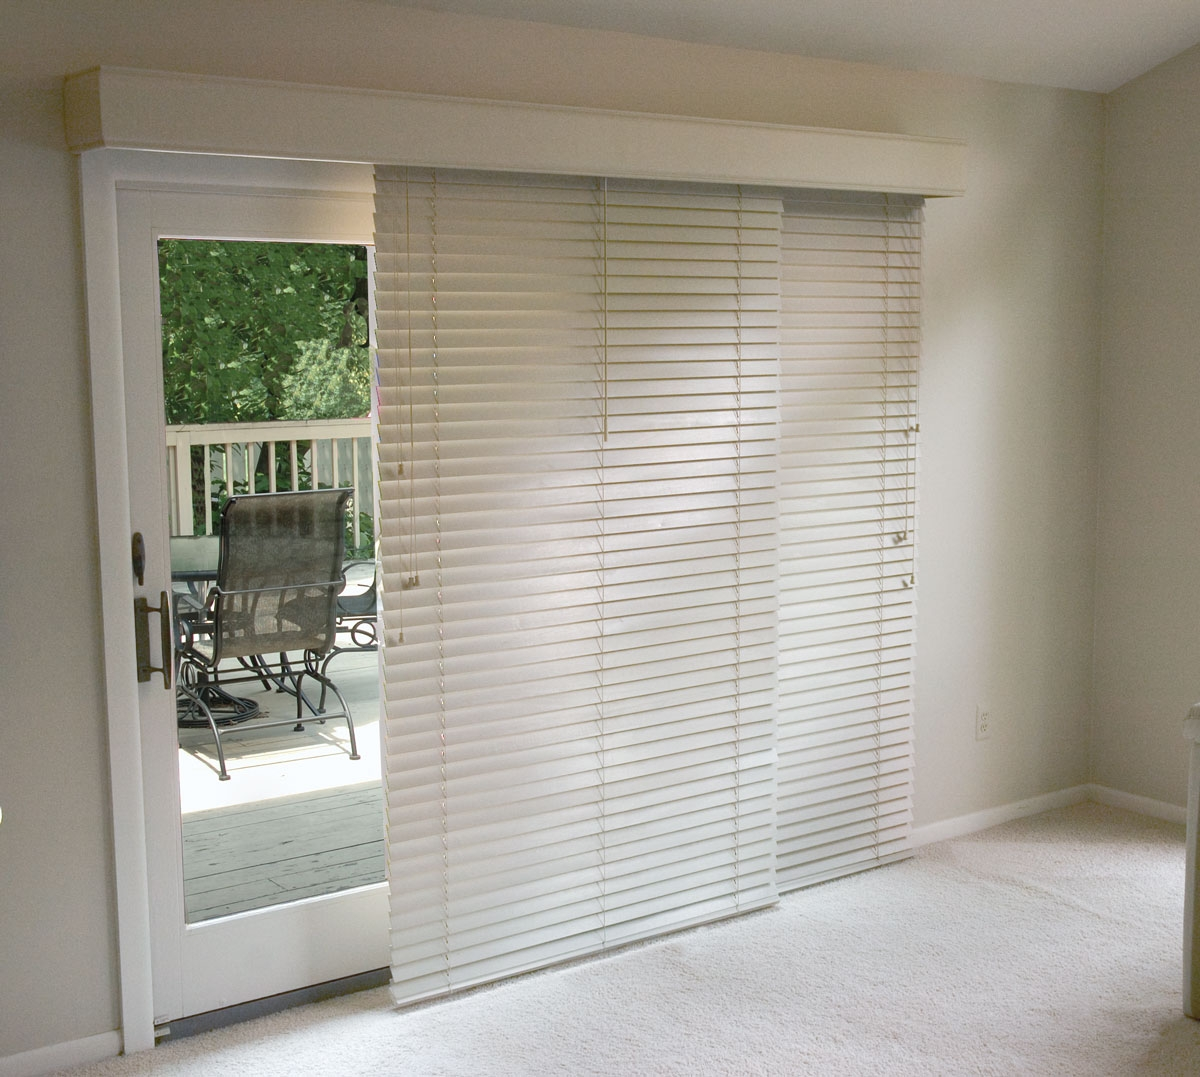 Horizontal Blinds For Sliding Patio Doorshorizontal blinds for patio doors glider blinds